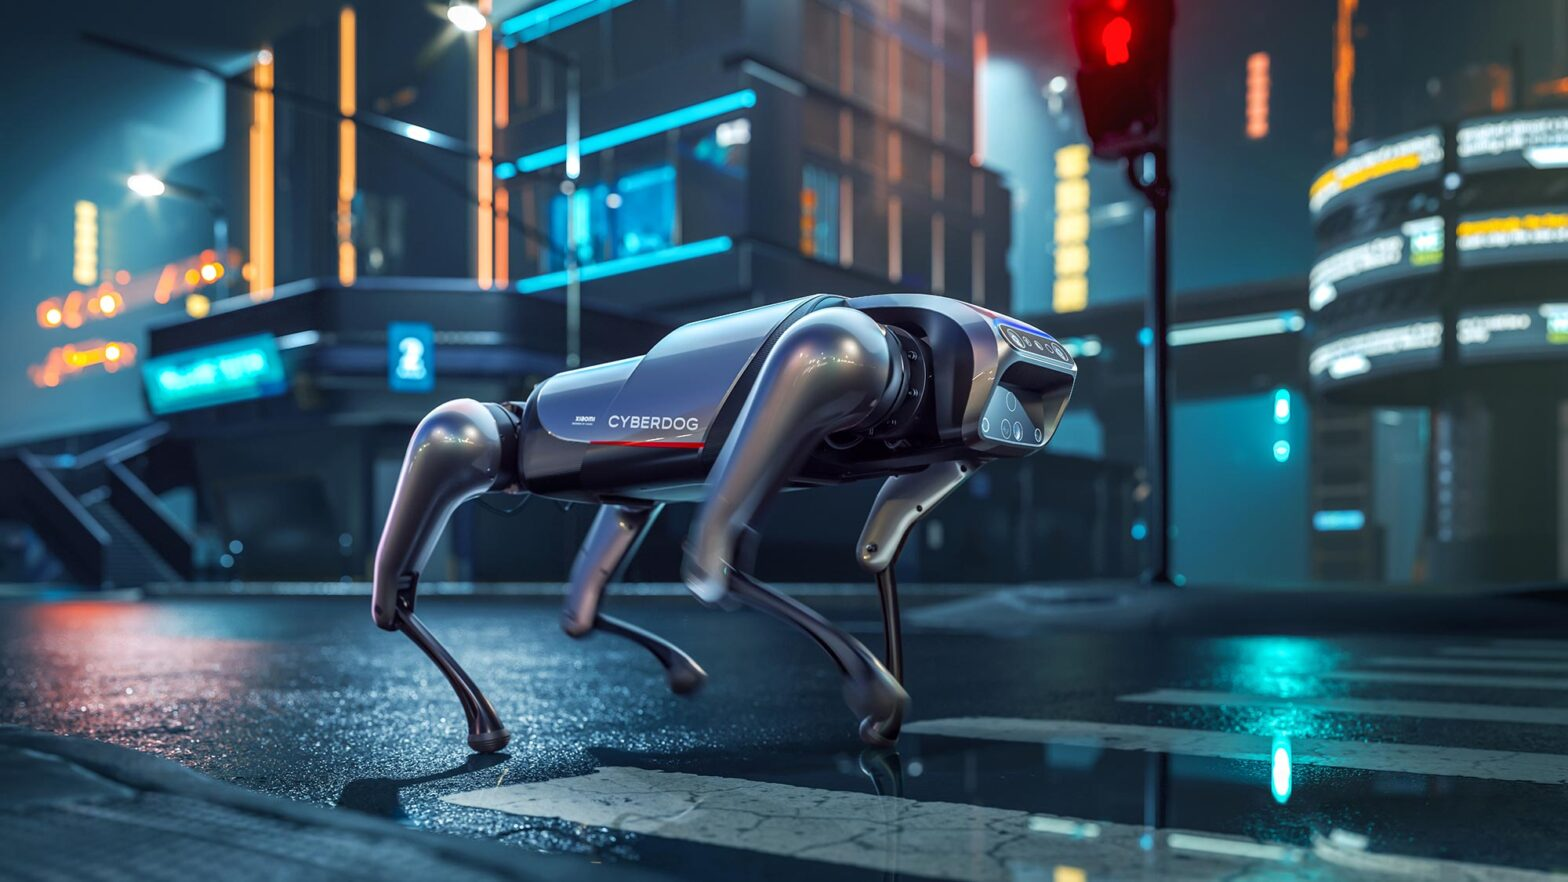 Xiaomi Cyberdog Bionic Quadruped Robot